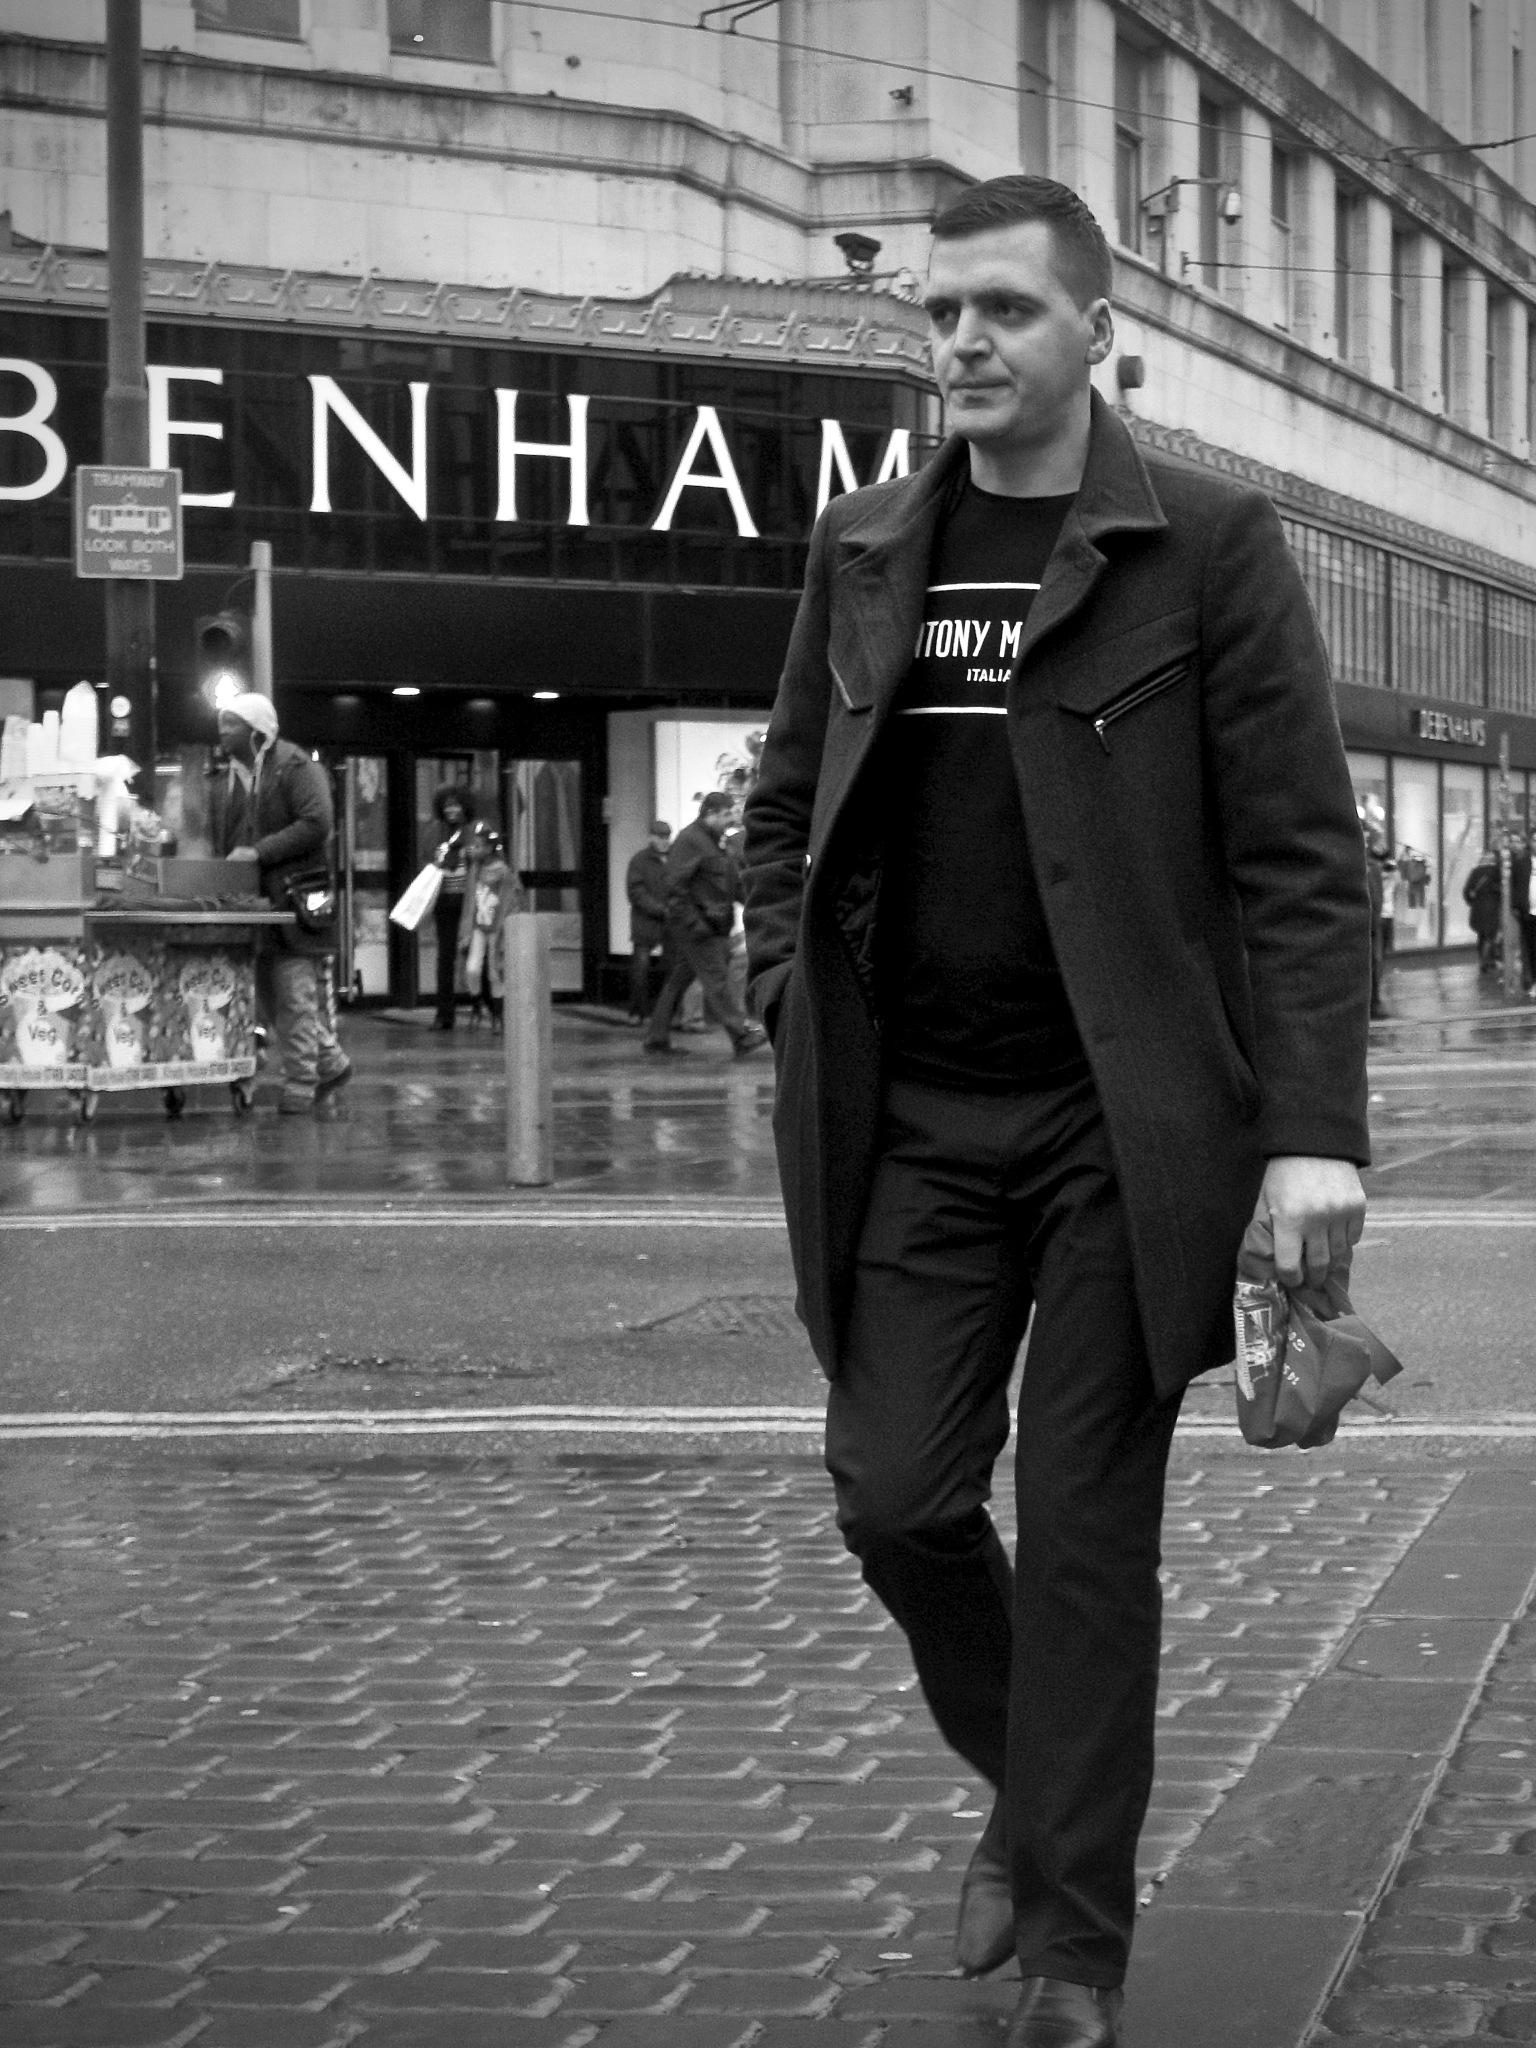 Market Street, Manchester City Centre, Manchester, UK. by StreetCrusader